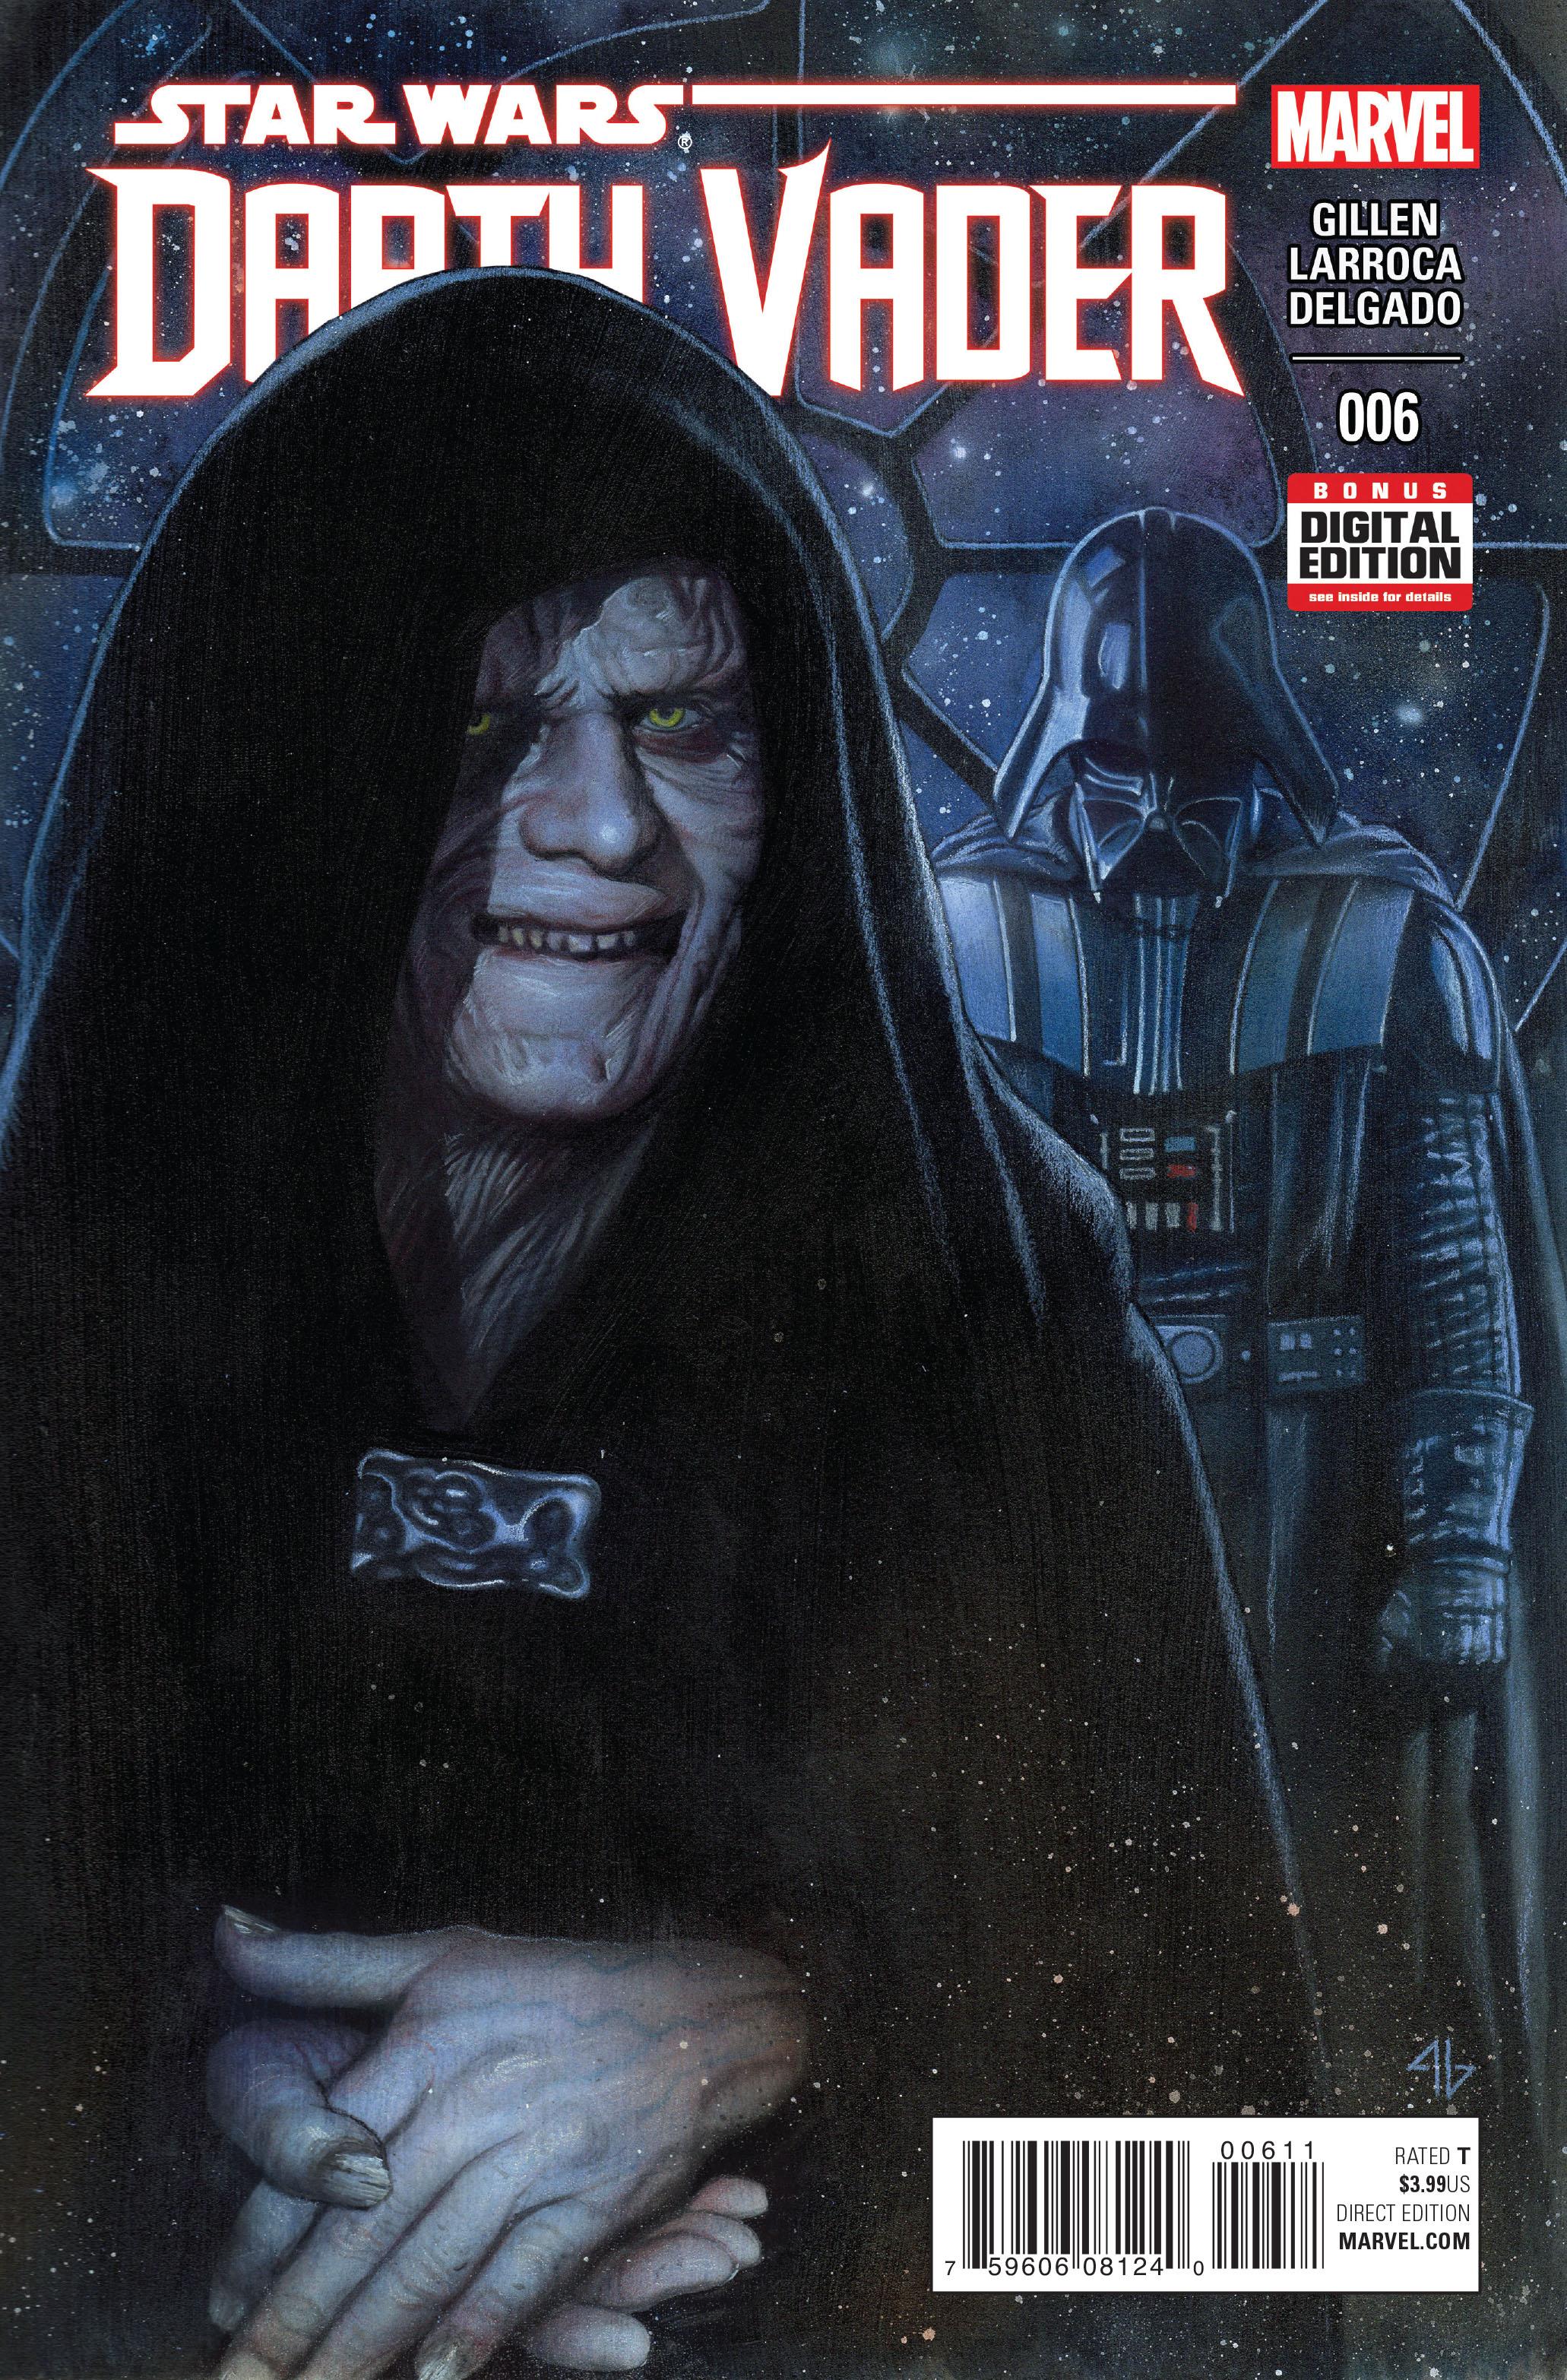 SW Darth Vader Cover 6